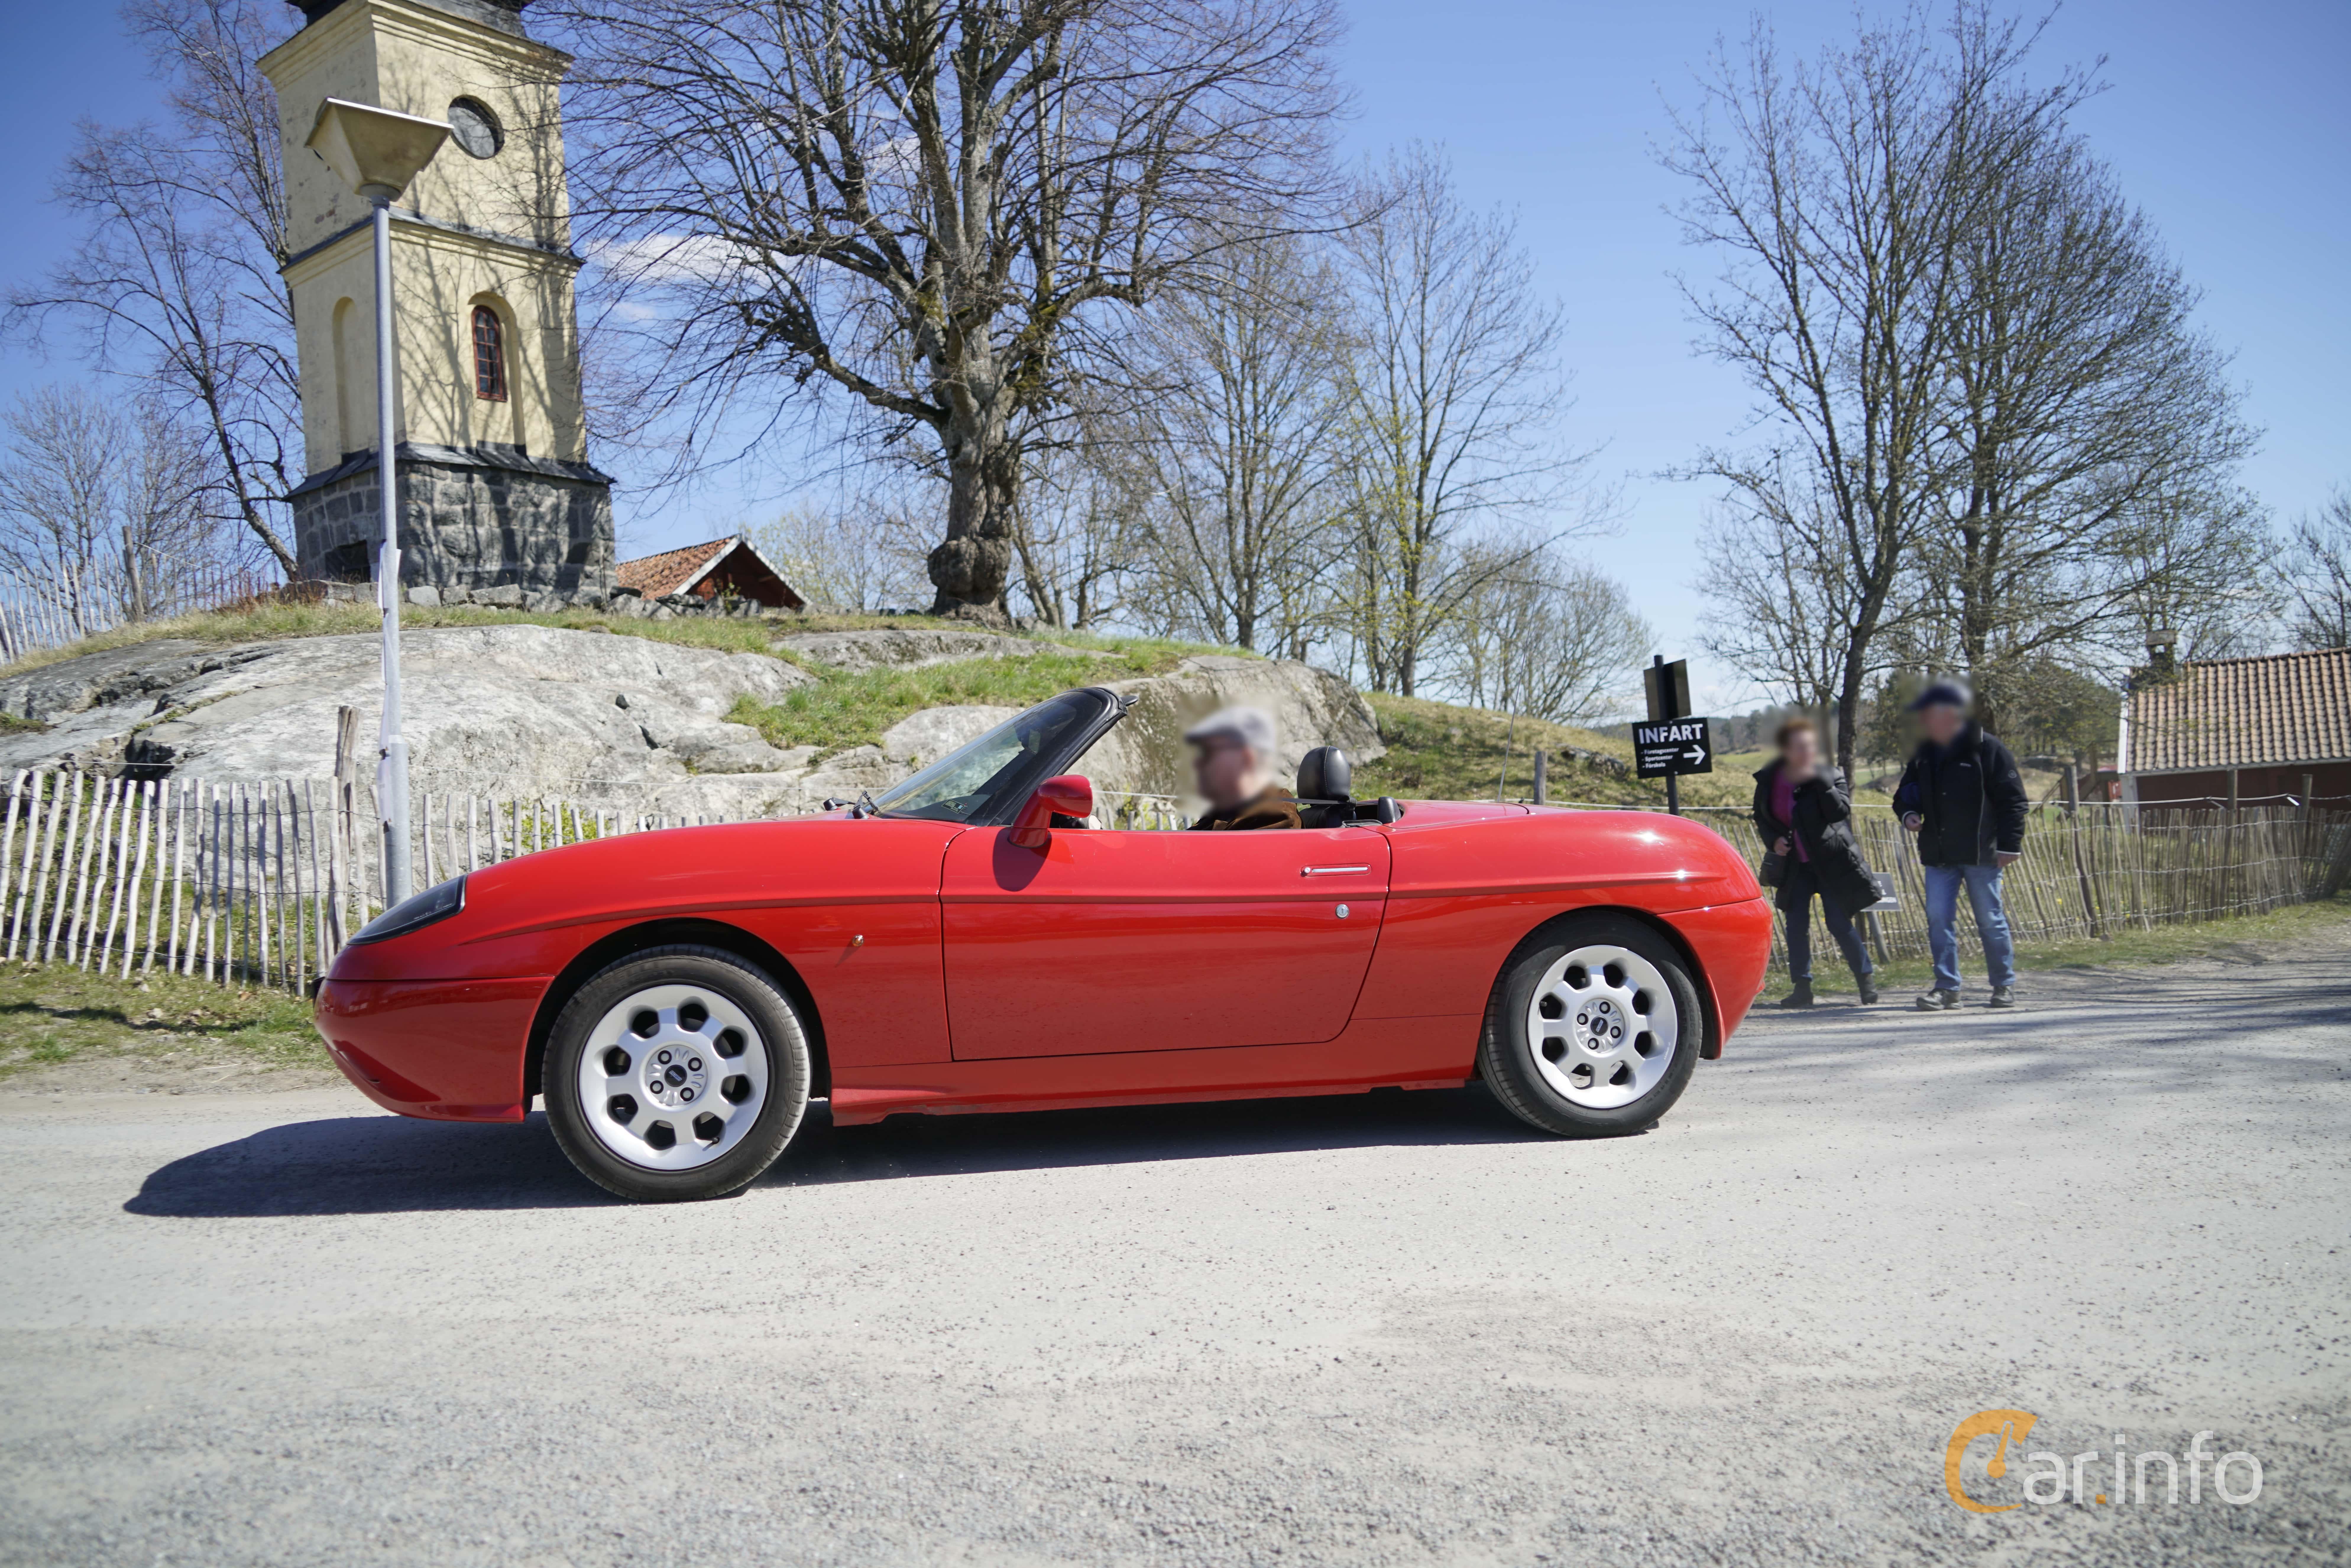 passenger vehicles barchetta brachetta pcmo recomme guy car fiat forums is recommendation gasoline re oil bob topics the ubbthreads motor